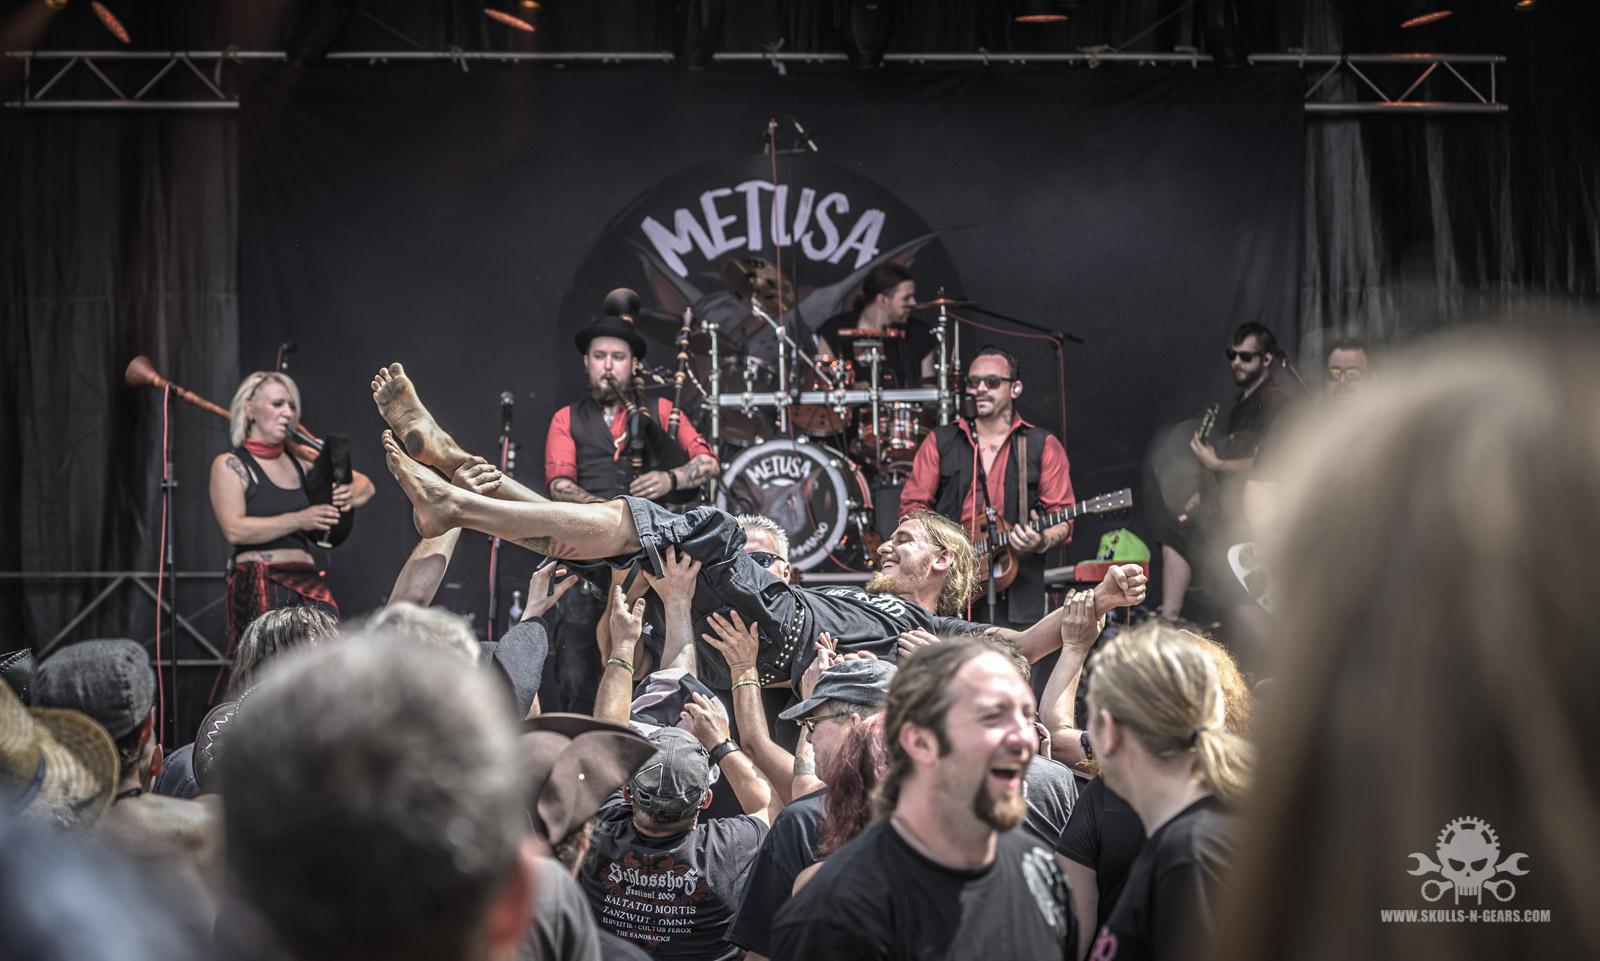 Schlosshof Festival - Metusa -16